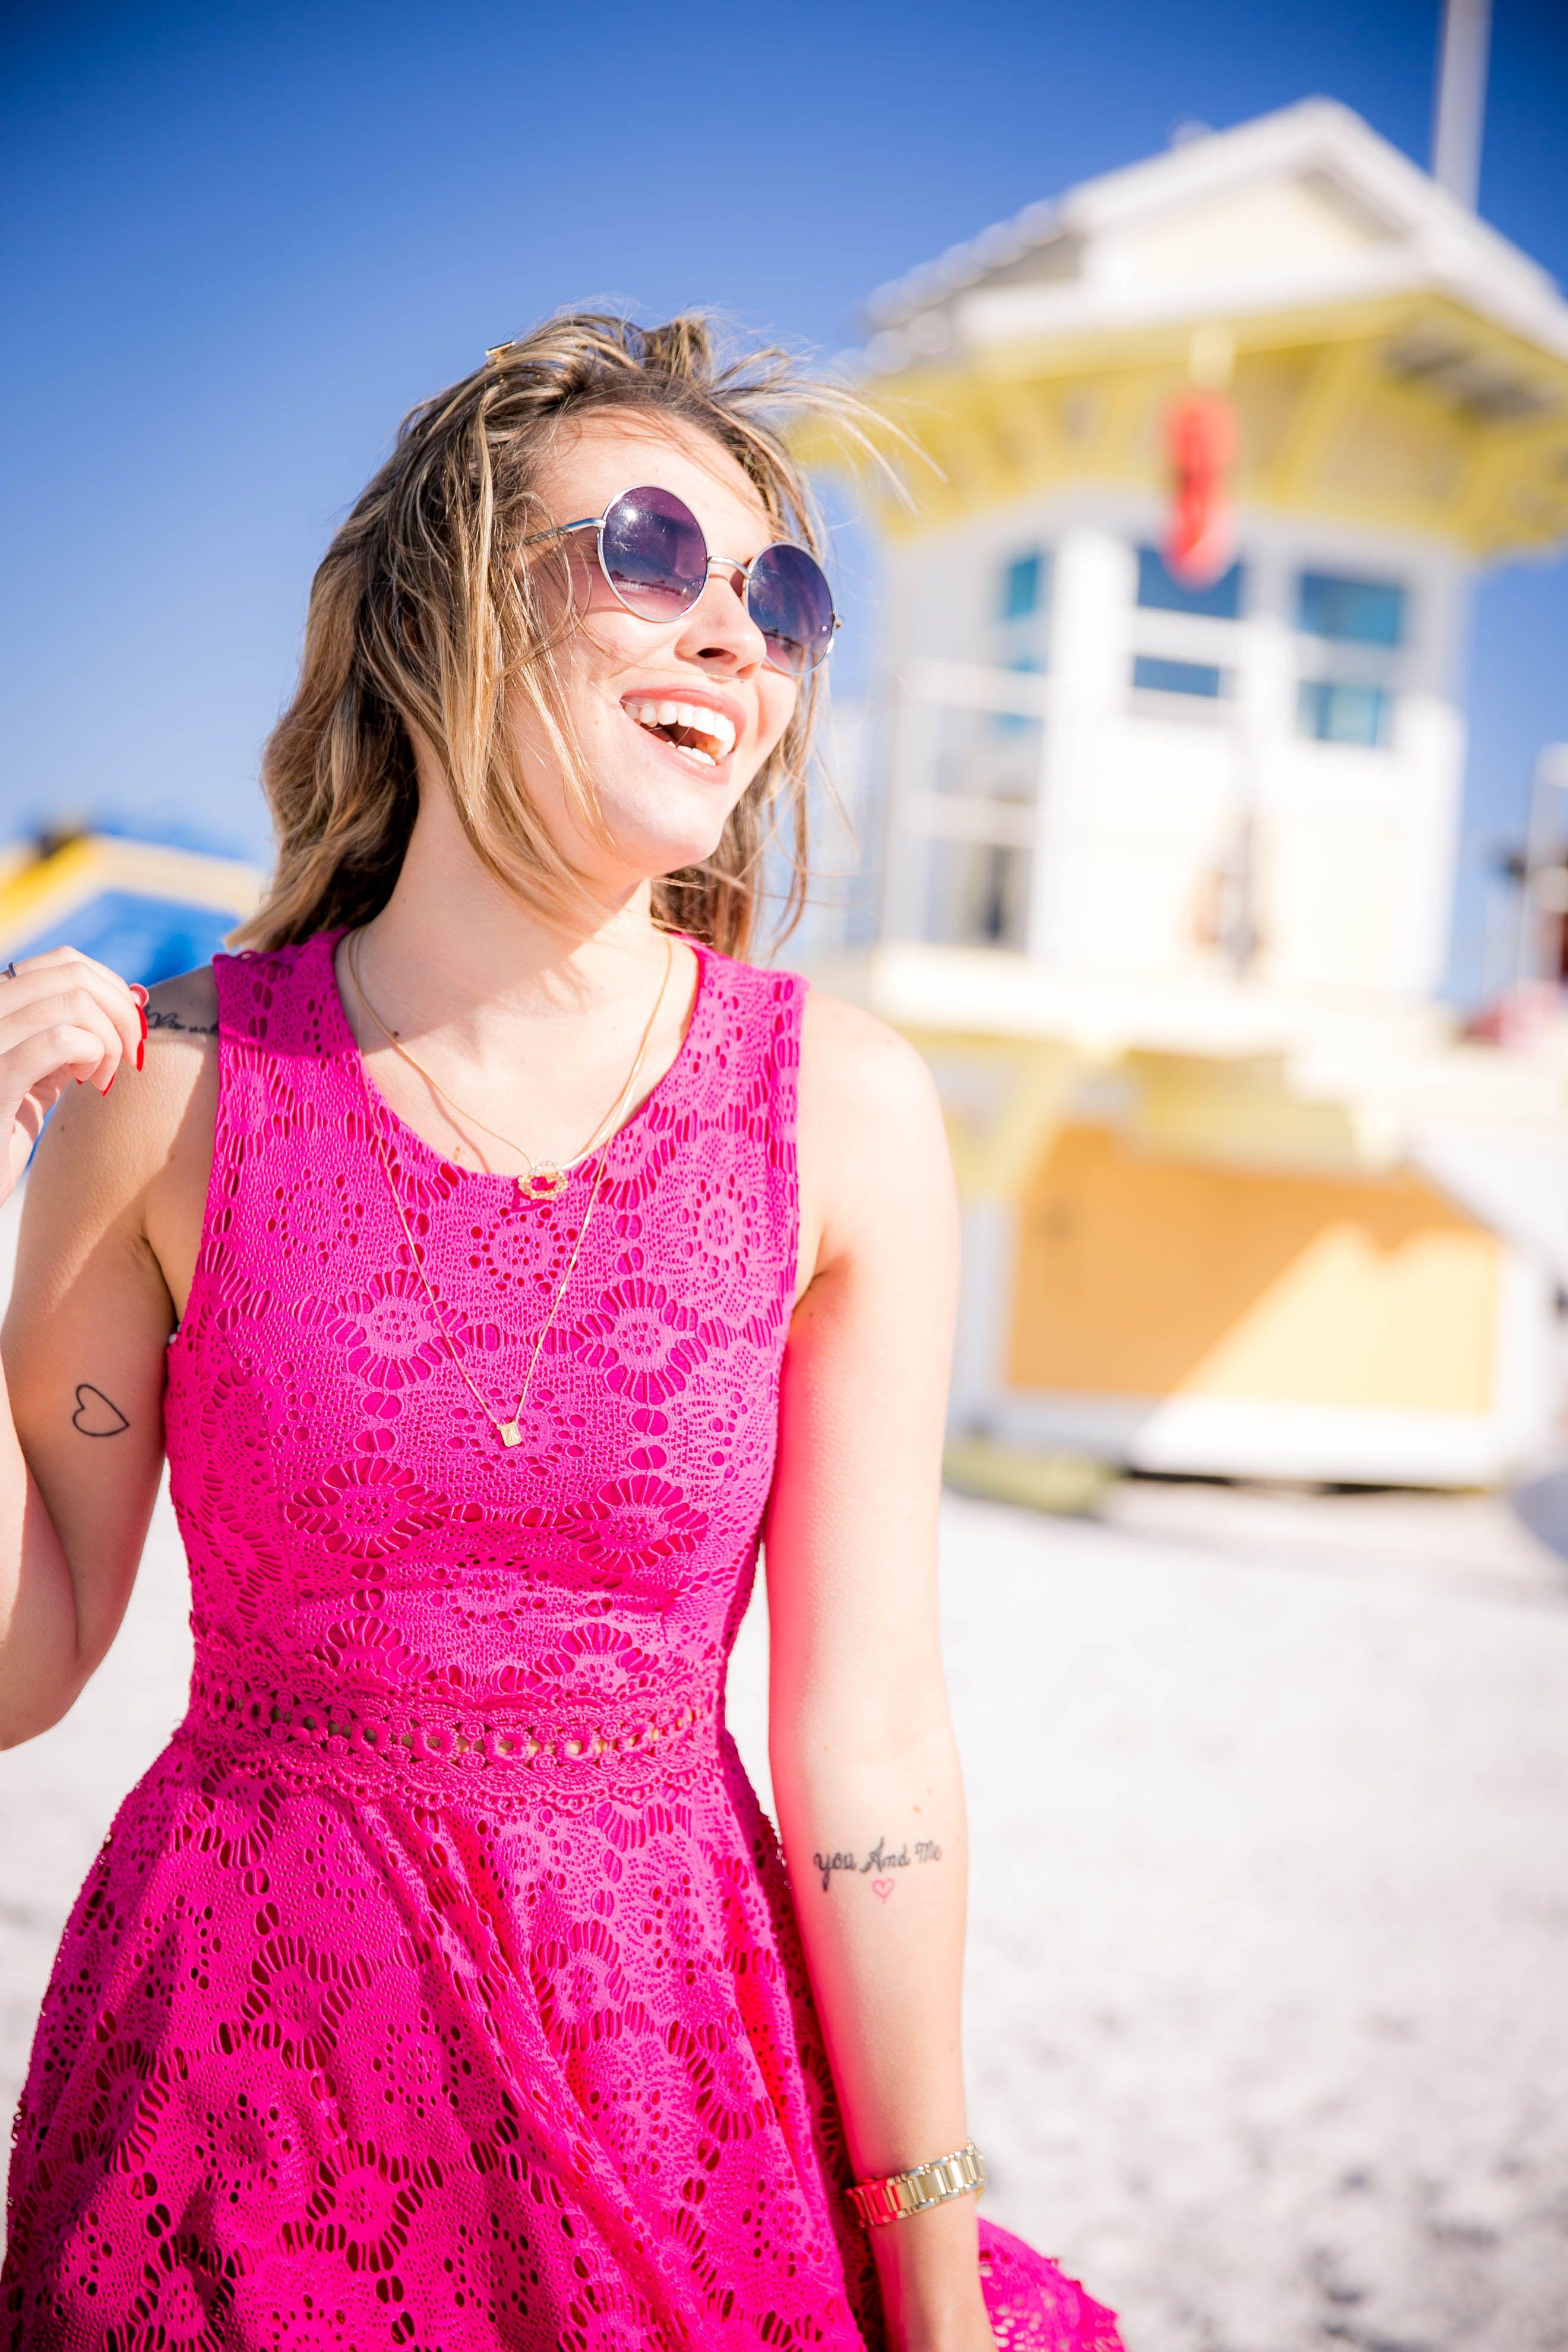 Vestido Rendado Pink   Fashion A b7f68ba8c5